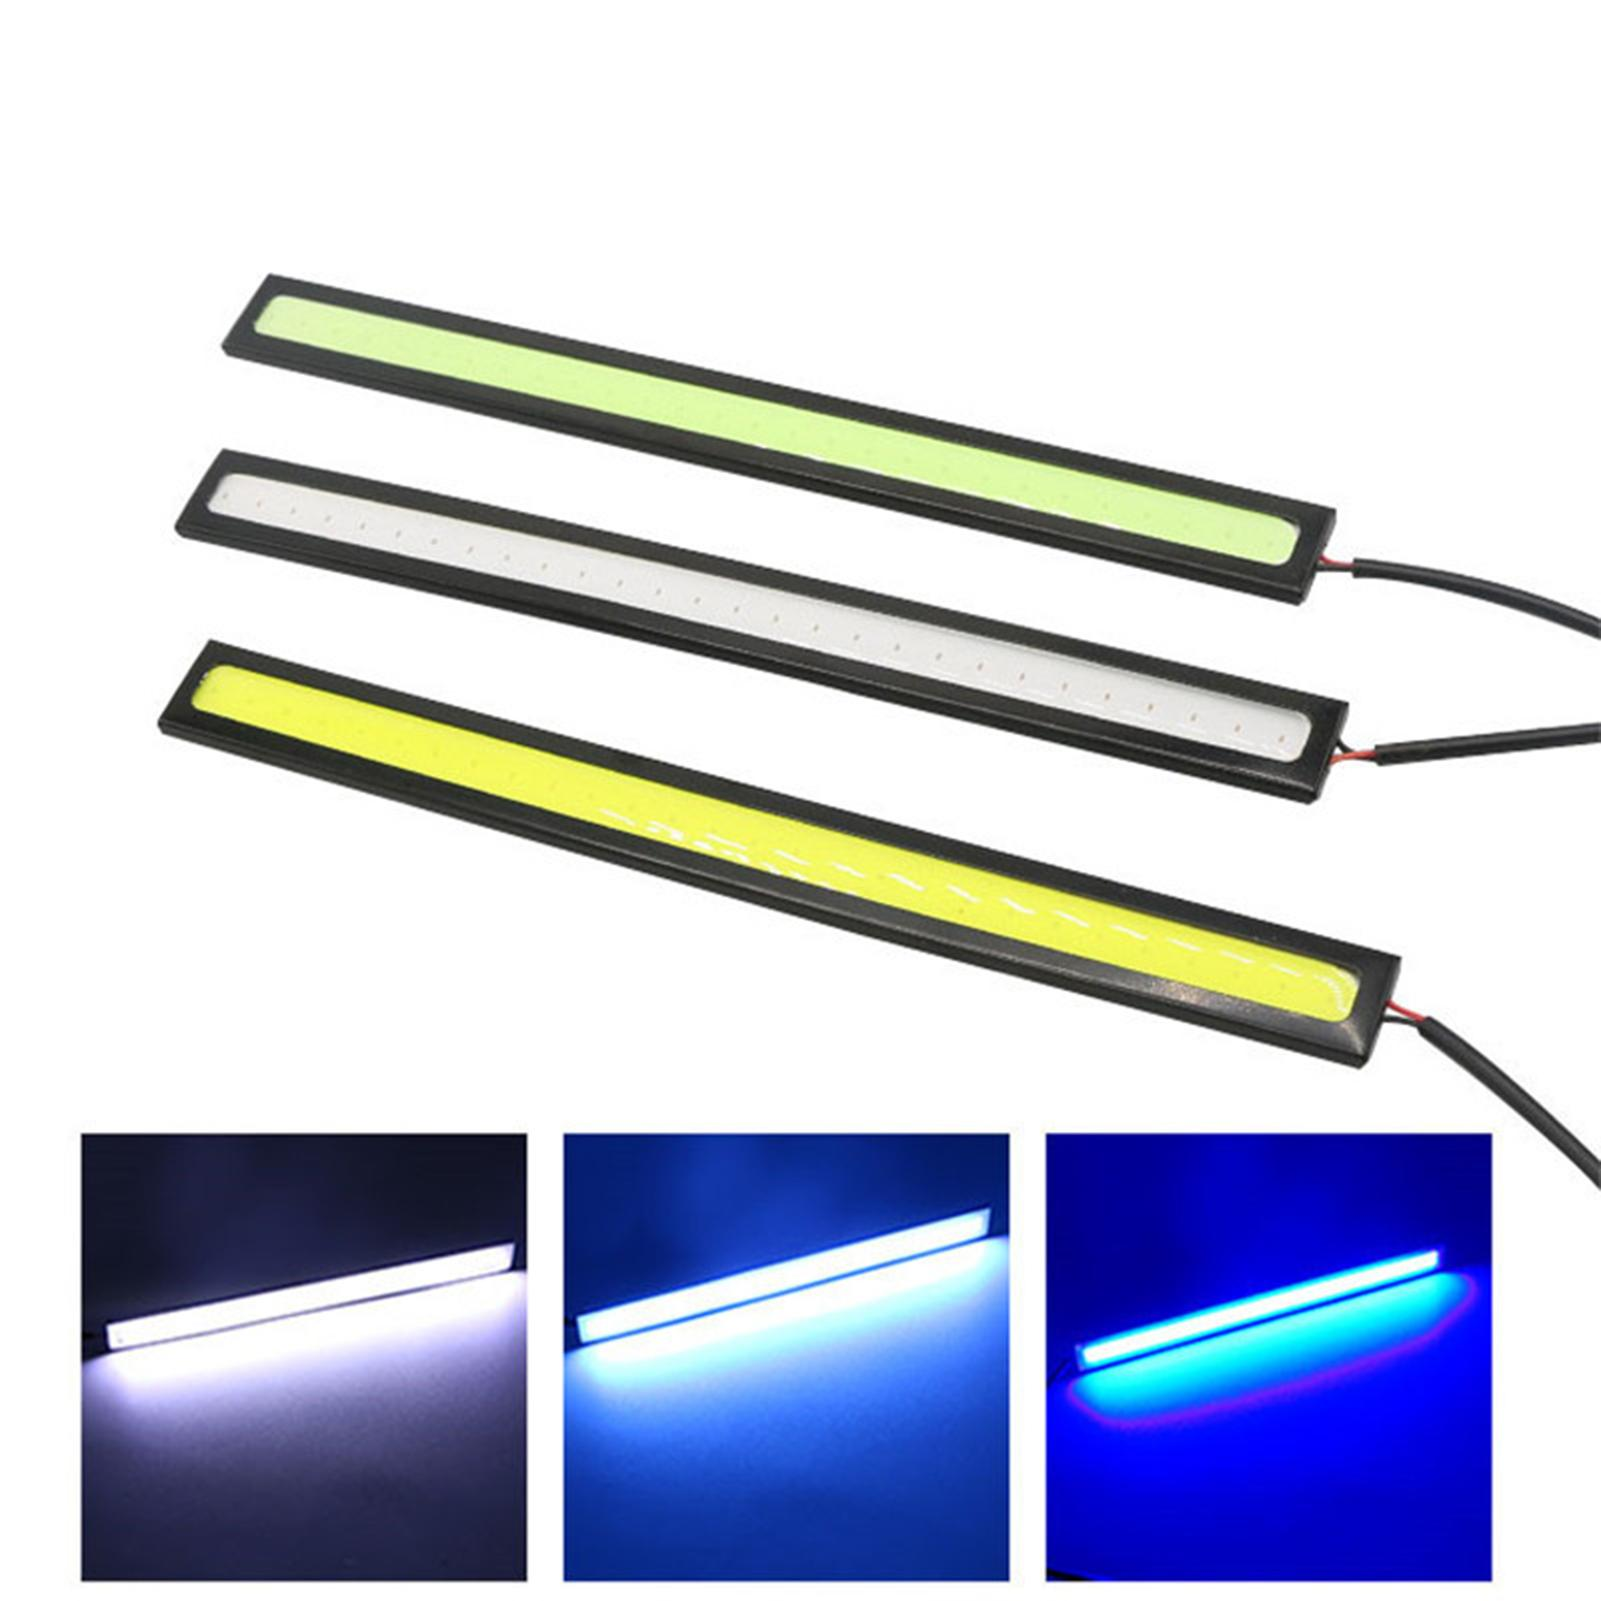 2Pcs Car Headlight LED 28 Lights Ultra-thin Waterproof COB Daytime Running Light for Universal Auto Modification